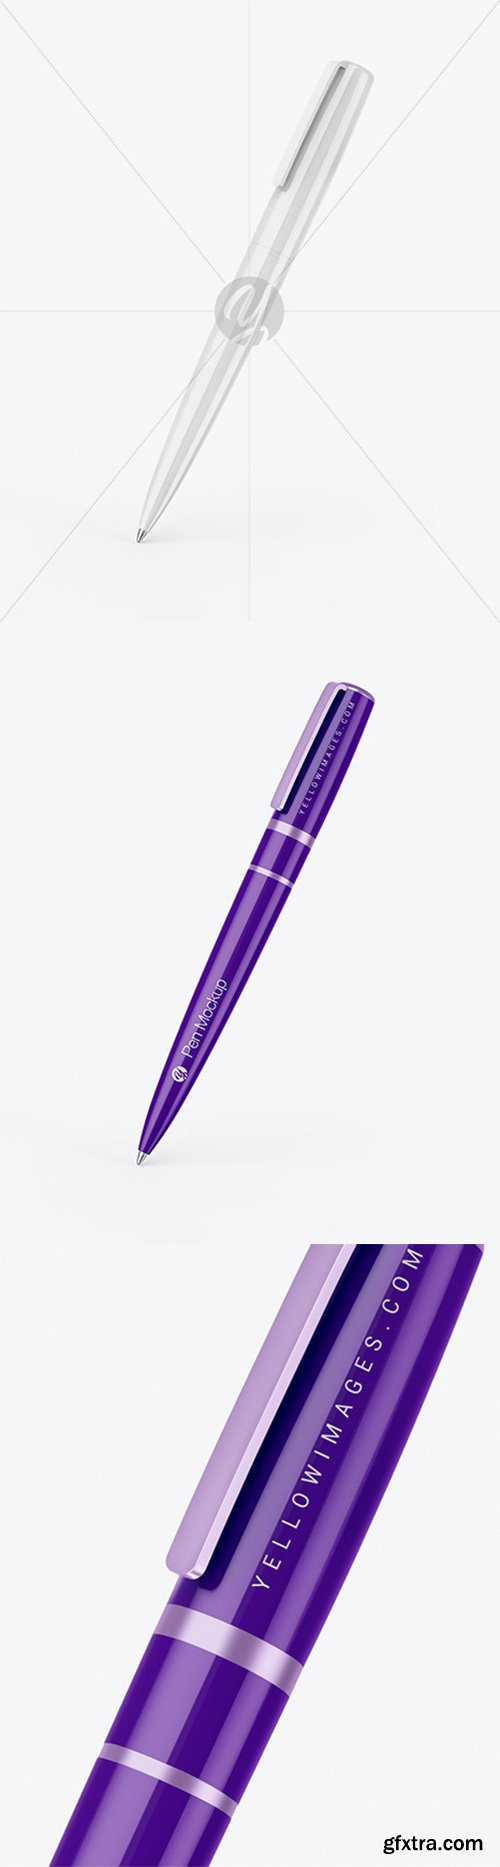 Glossy Pen Mockup 59660